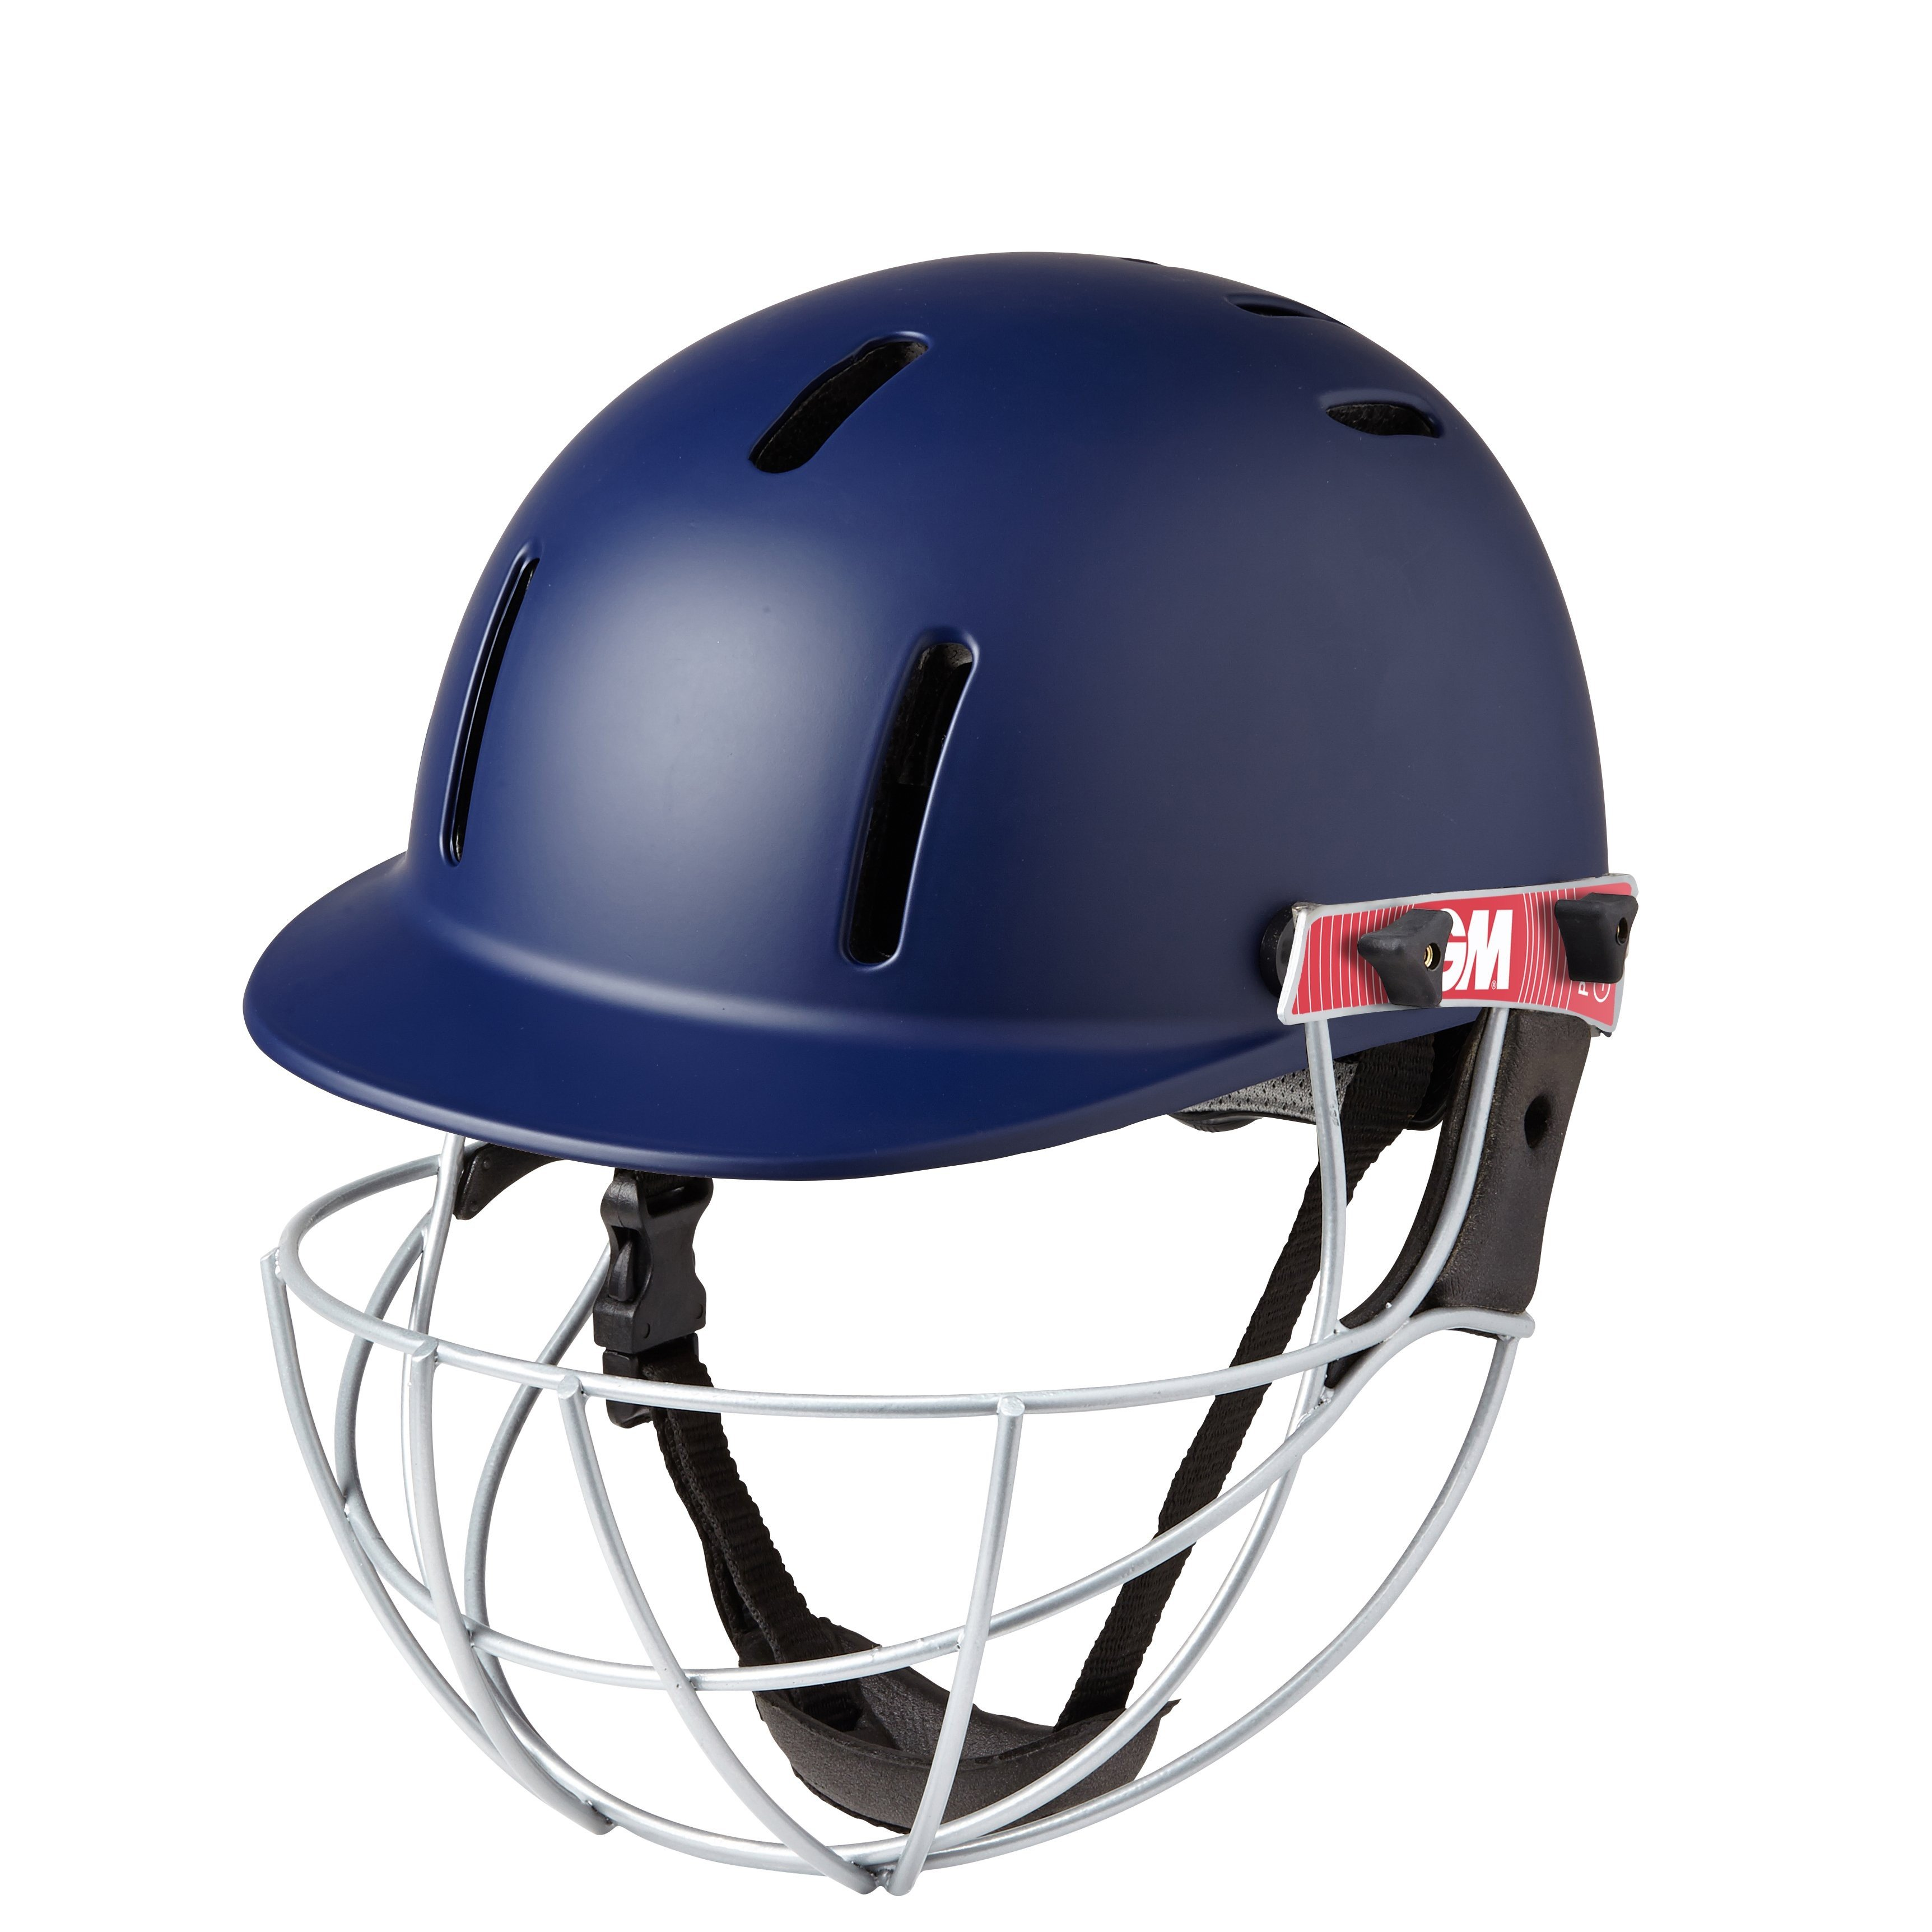 2017 Gunn and Moore Purist Geo Cricket Helmet